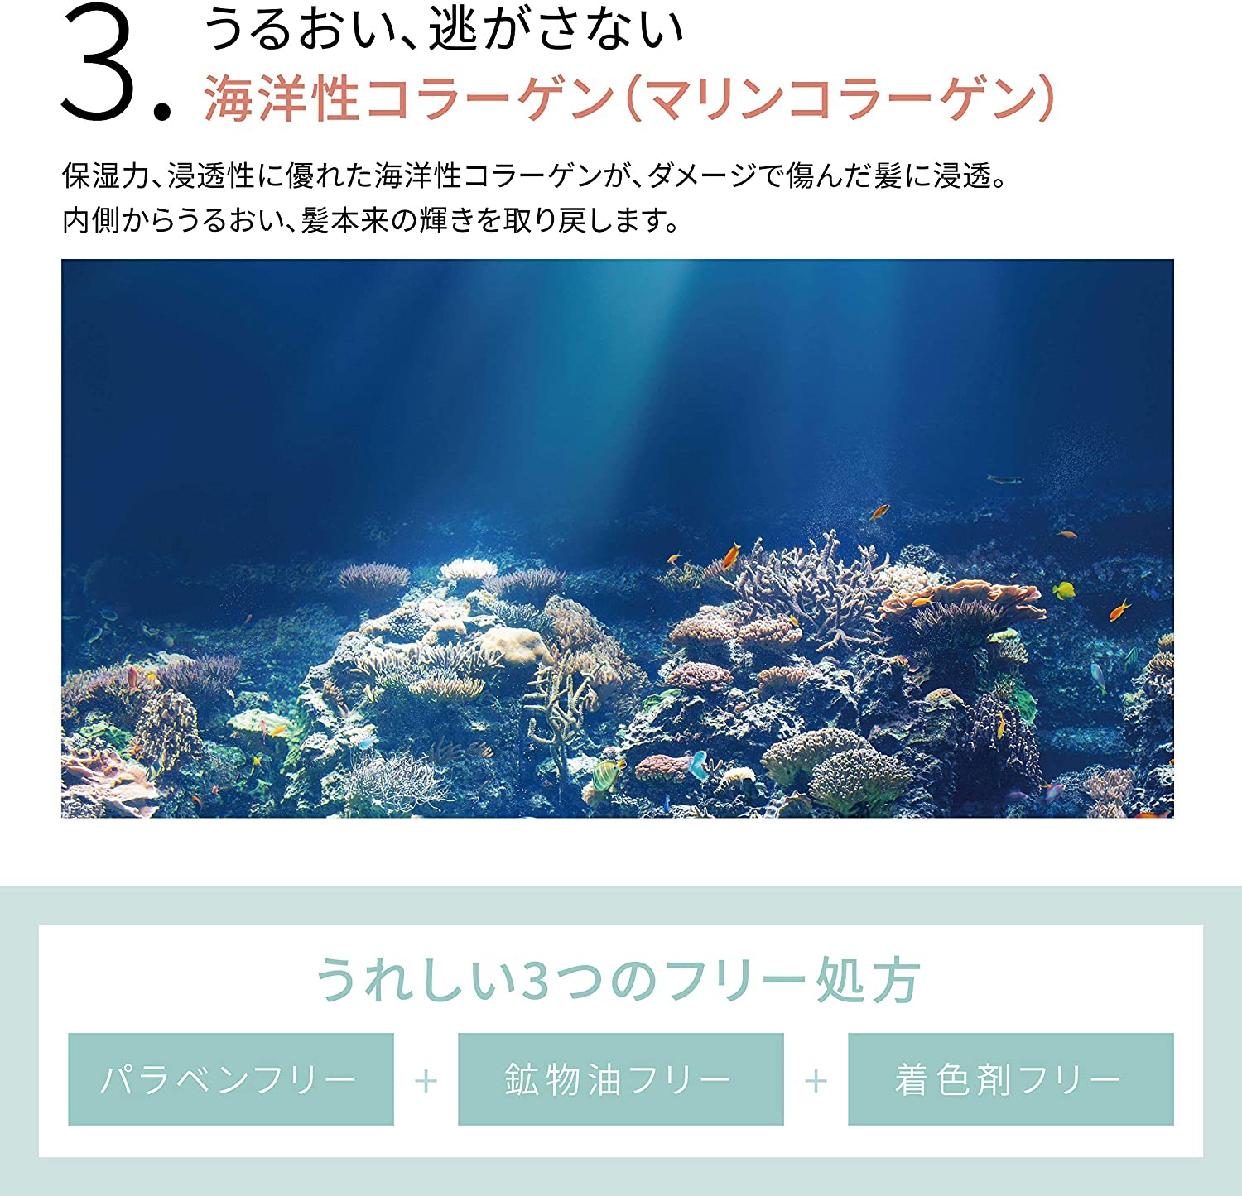 NALOW(ナロウ) ディープ モイスト シャンプーの商品画像5